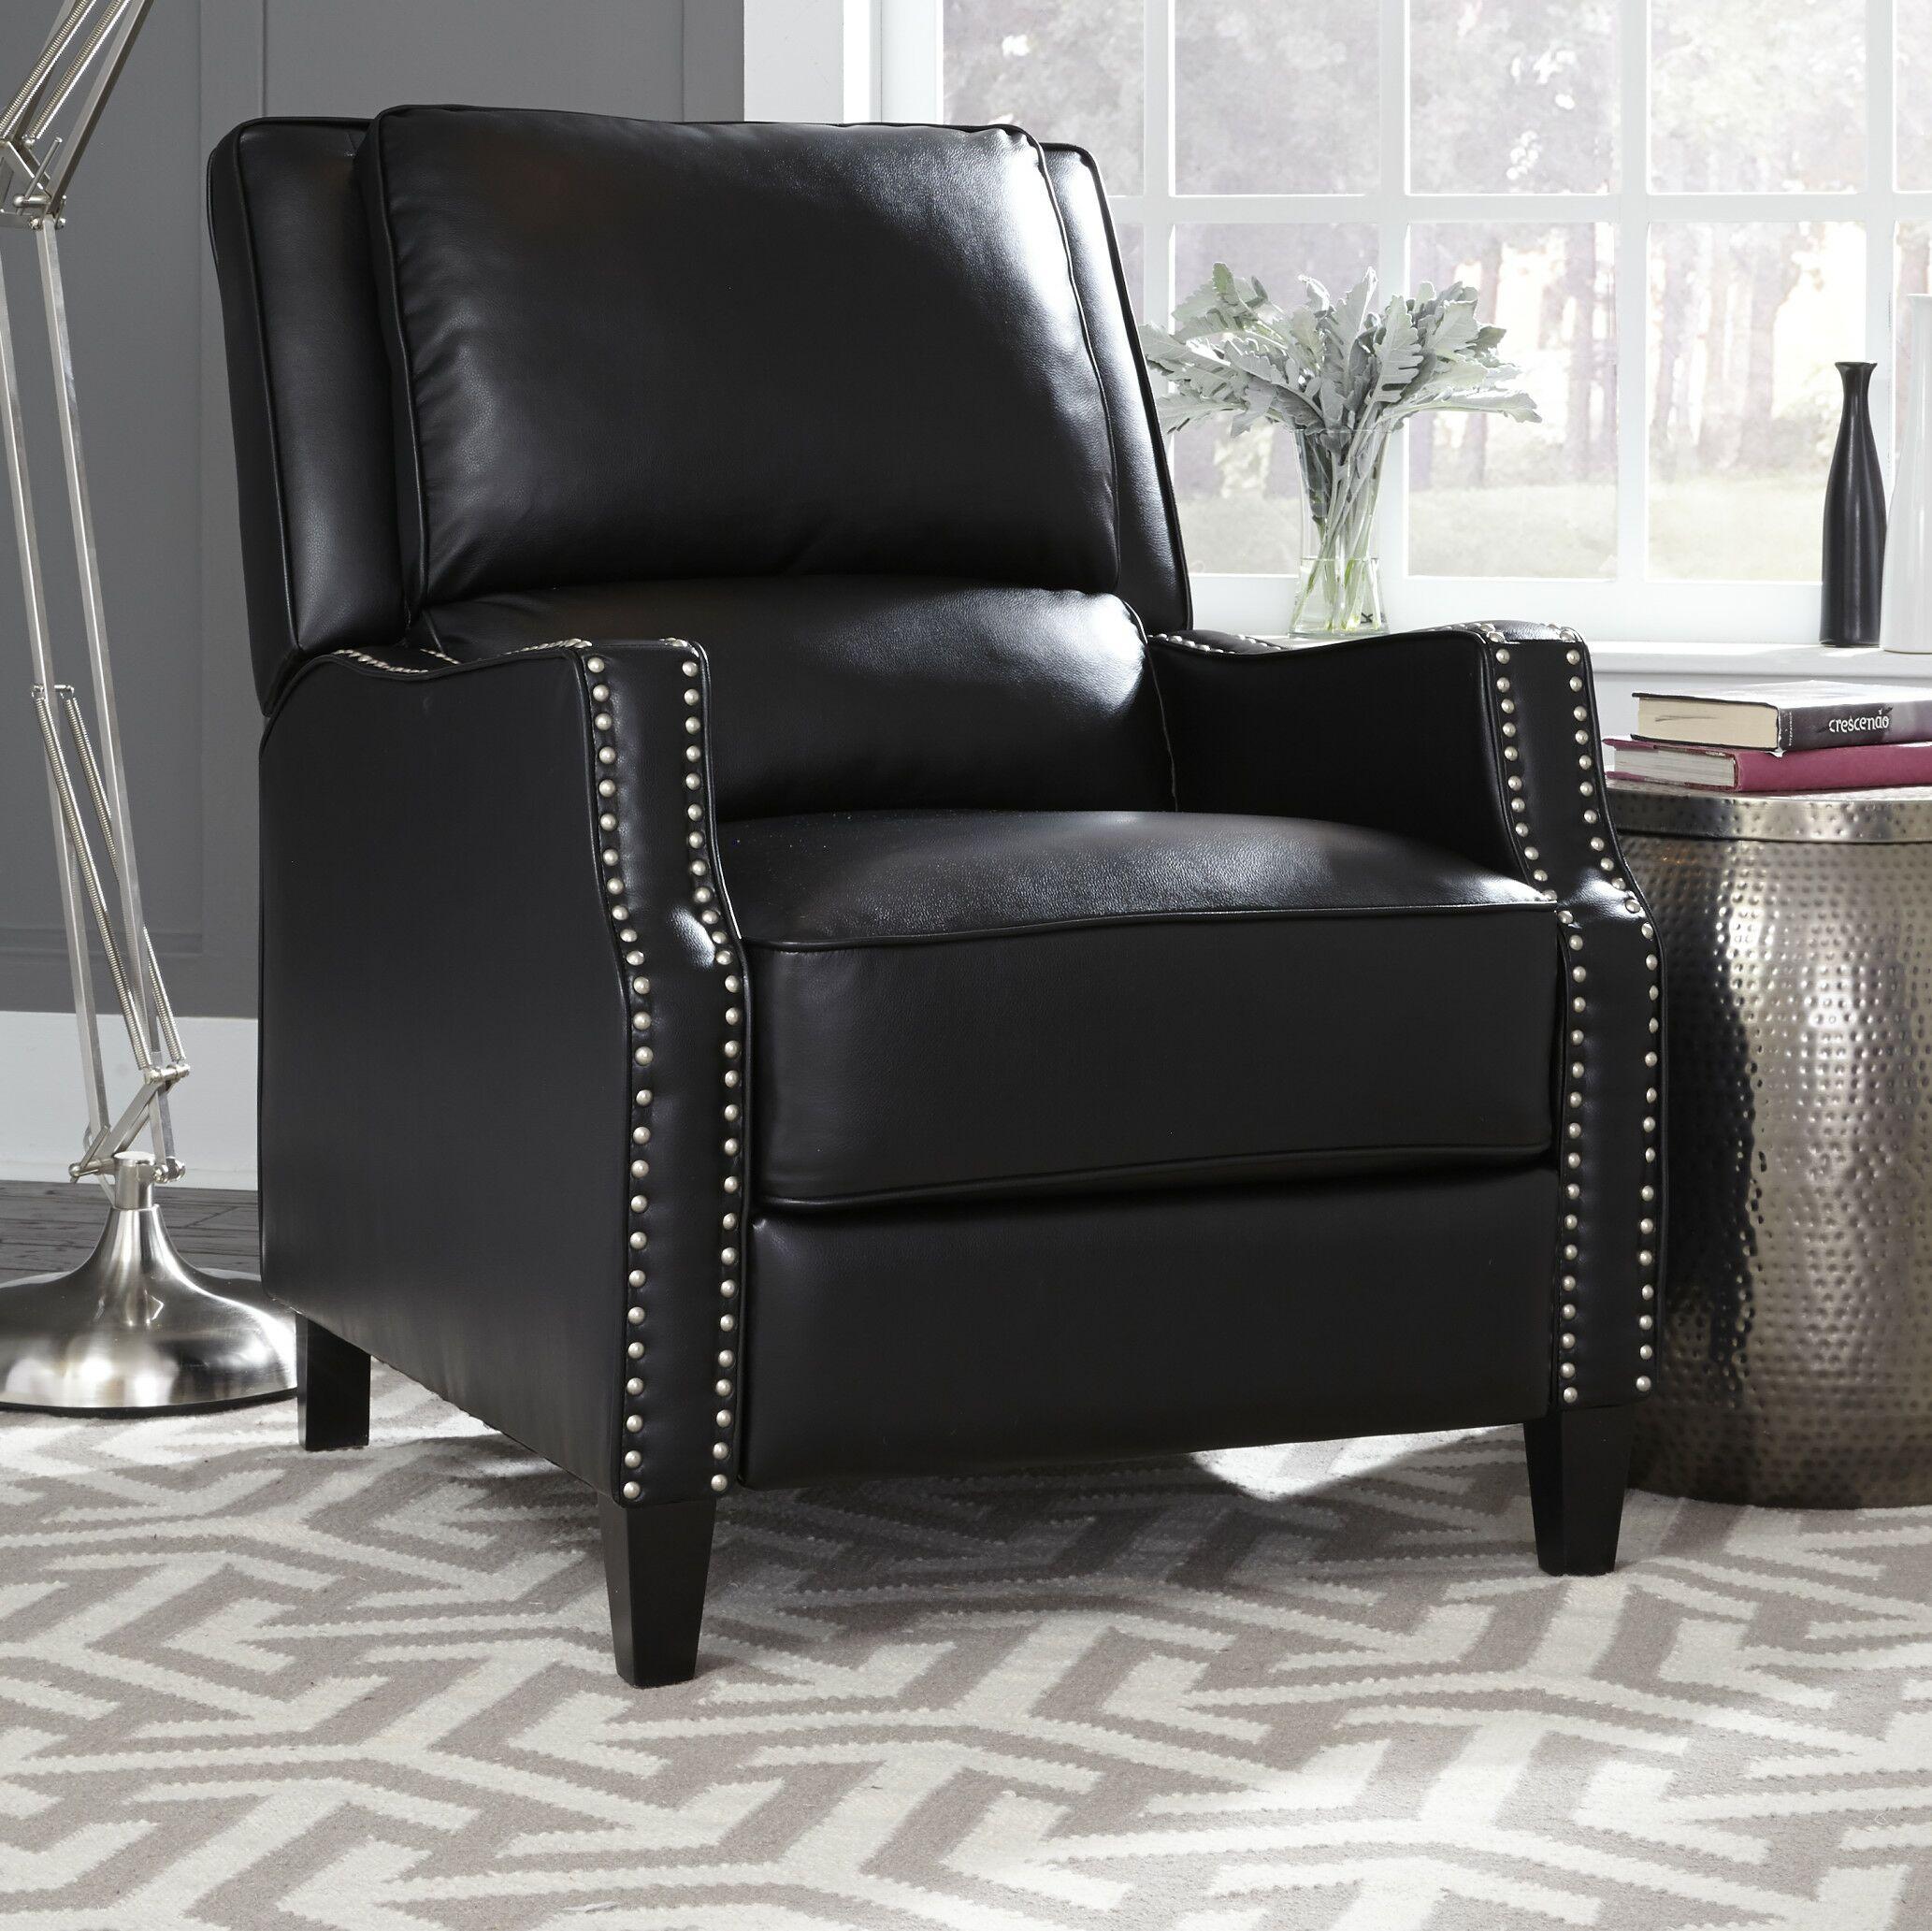 Gillies Manual Recliner Upholstery: Black